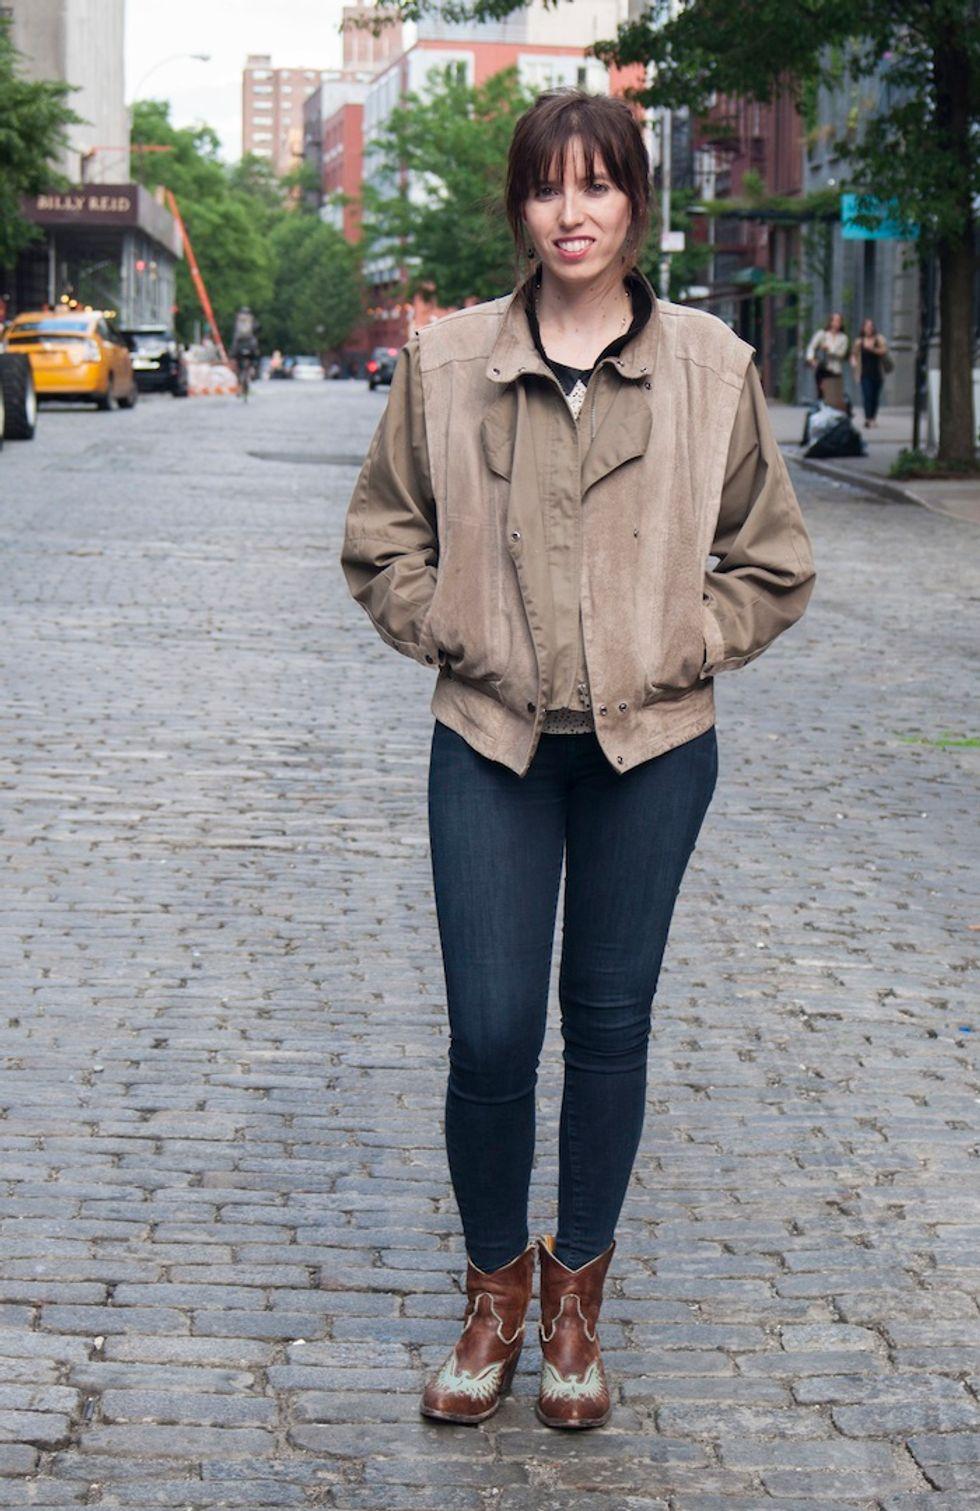 Fort Tilden Writer/Director Sarah-Violet Bliss Is Indie Cinema's Next Big Thing